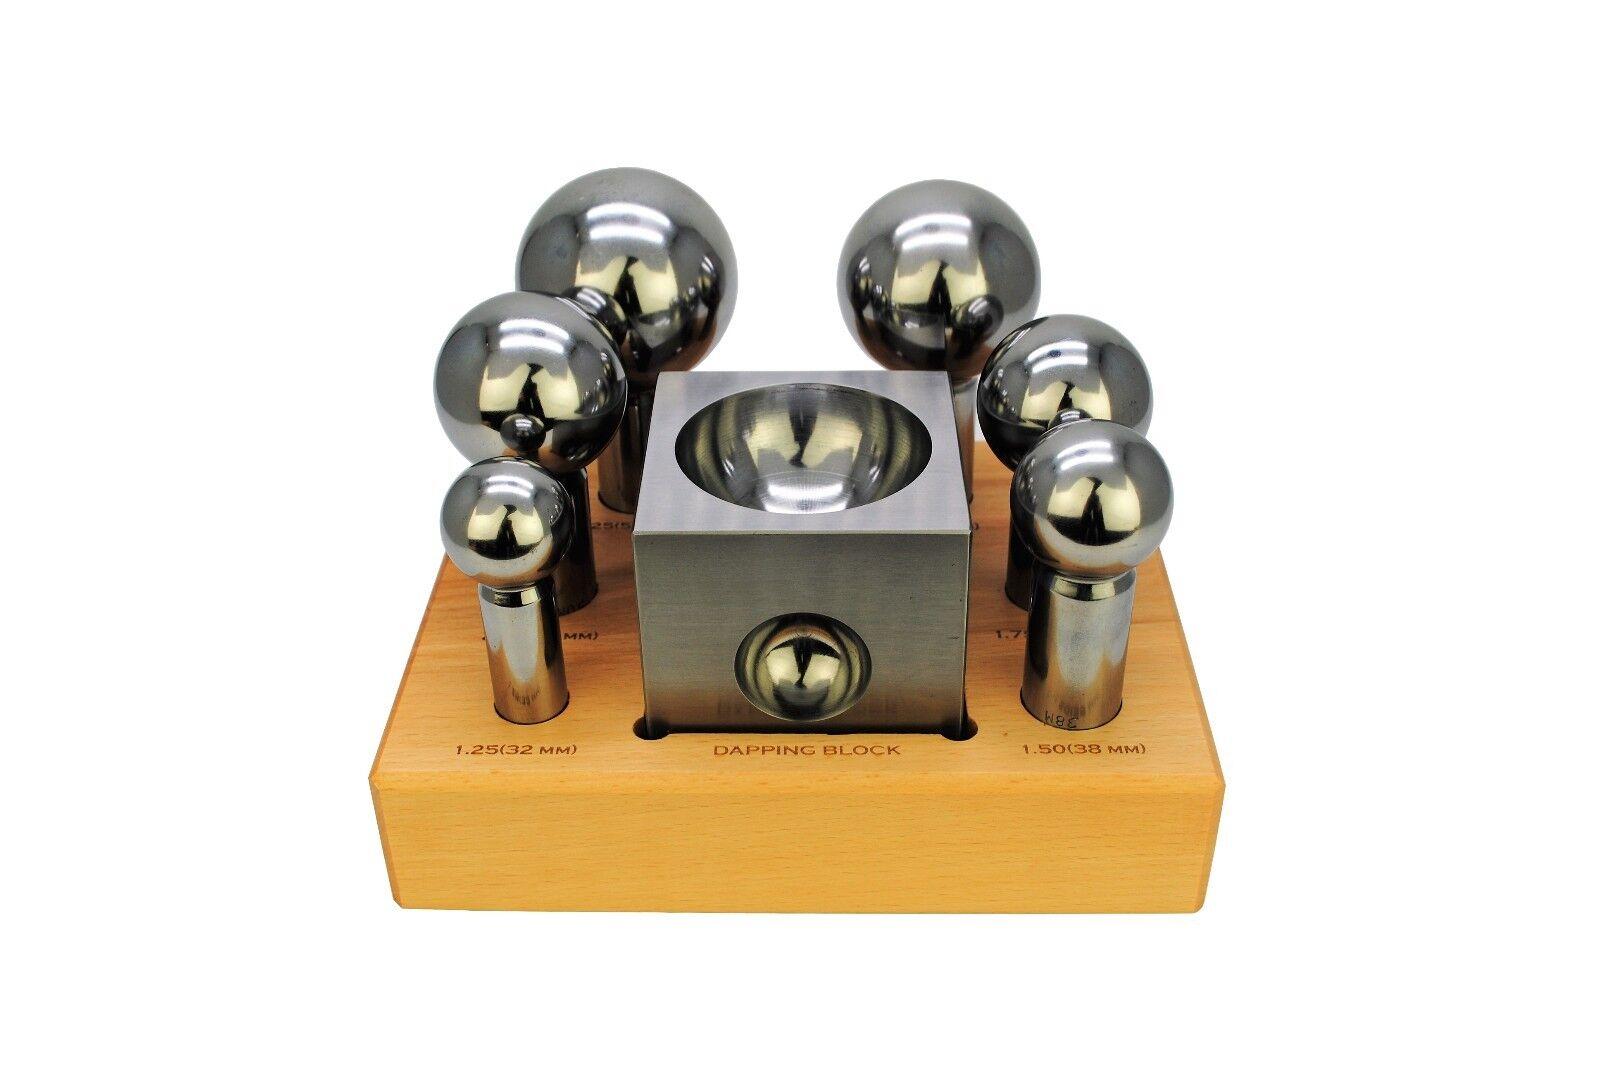 XL dômes Acier dômes XL Dapping 6 Piece Punch Set, 32 - 63 mm Poinçons & Bloc. J1328 bc2808